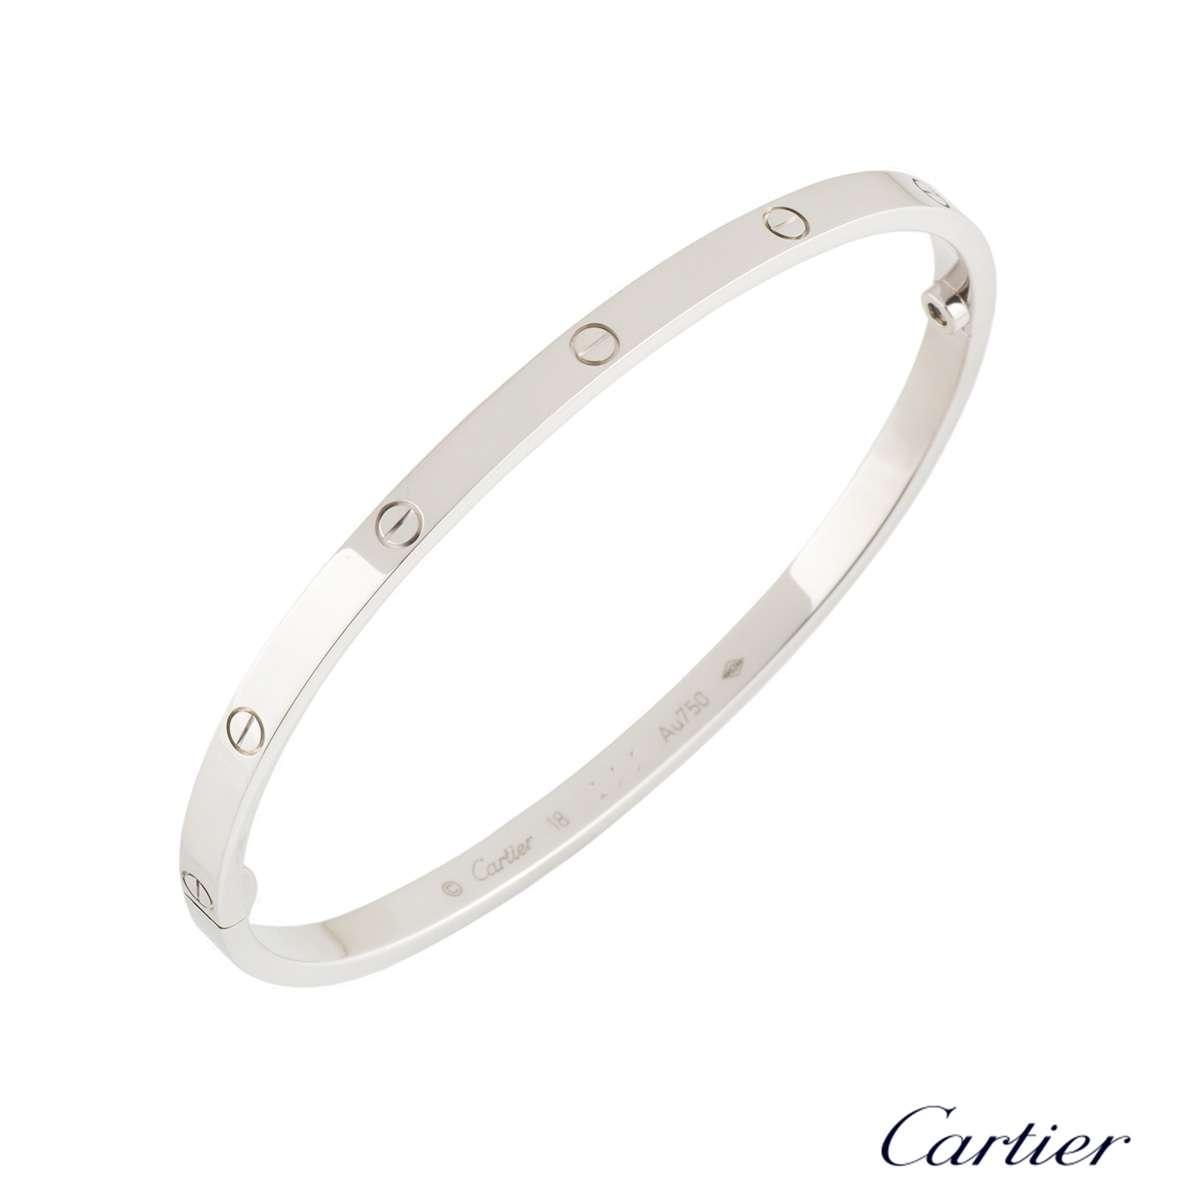 Cartier White Gold Love Bracelet SM Size 18B6047418